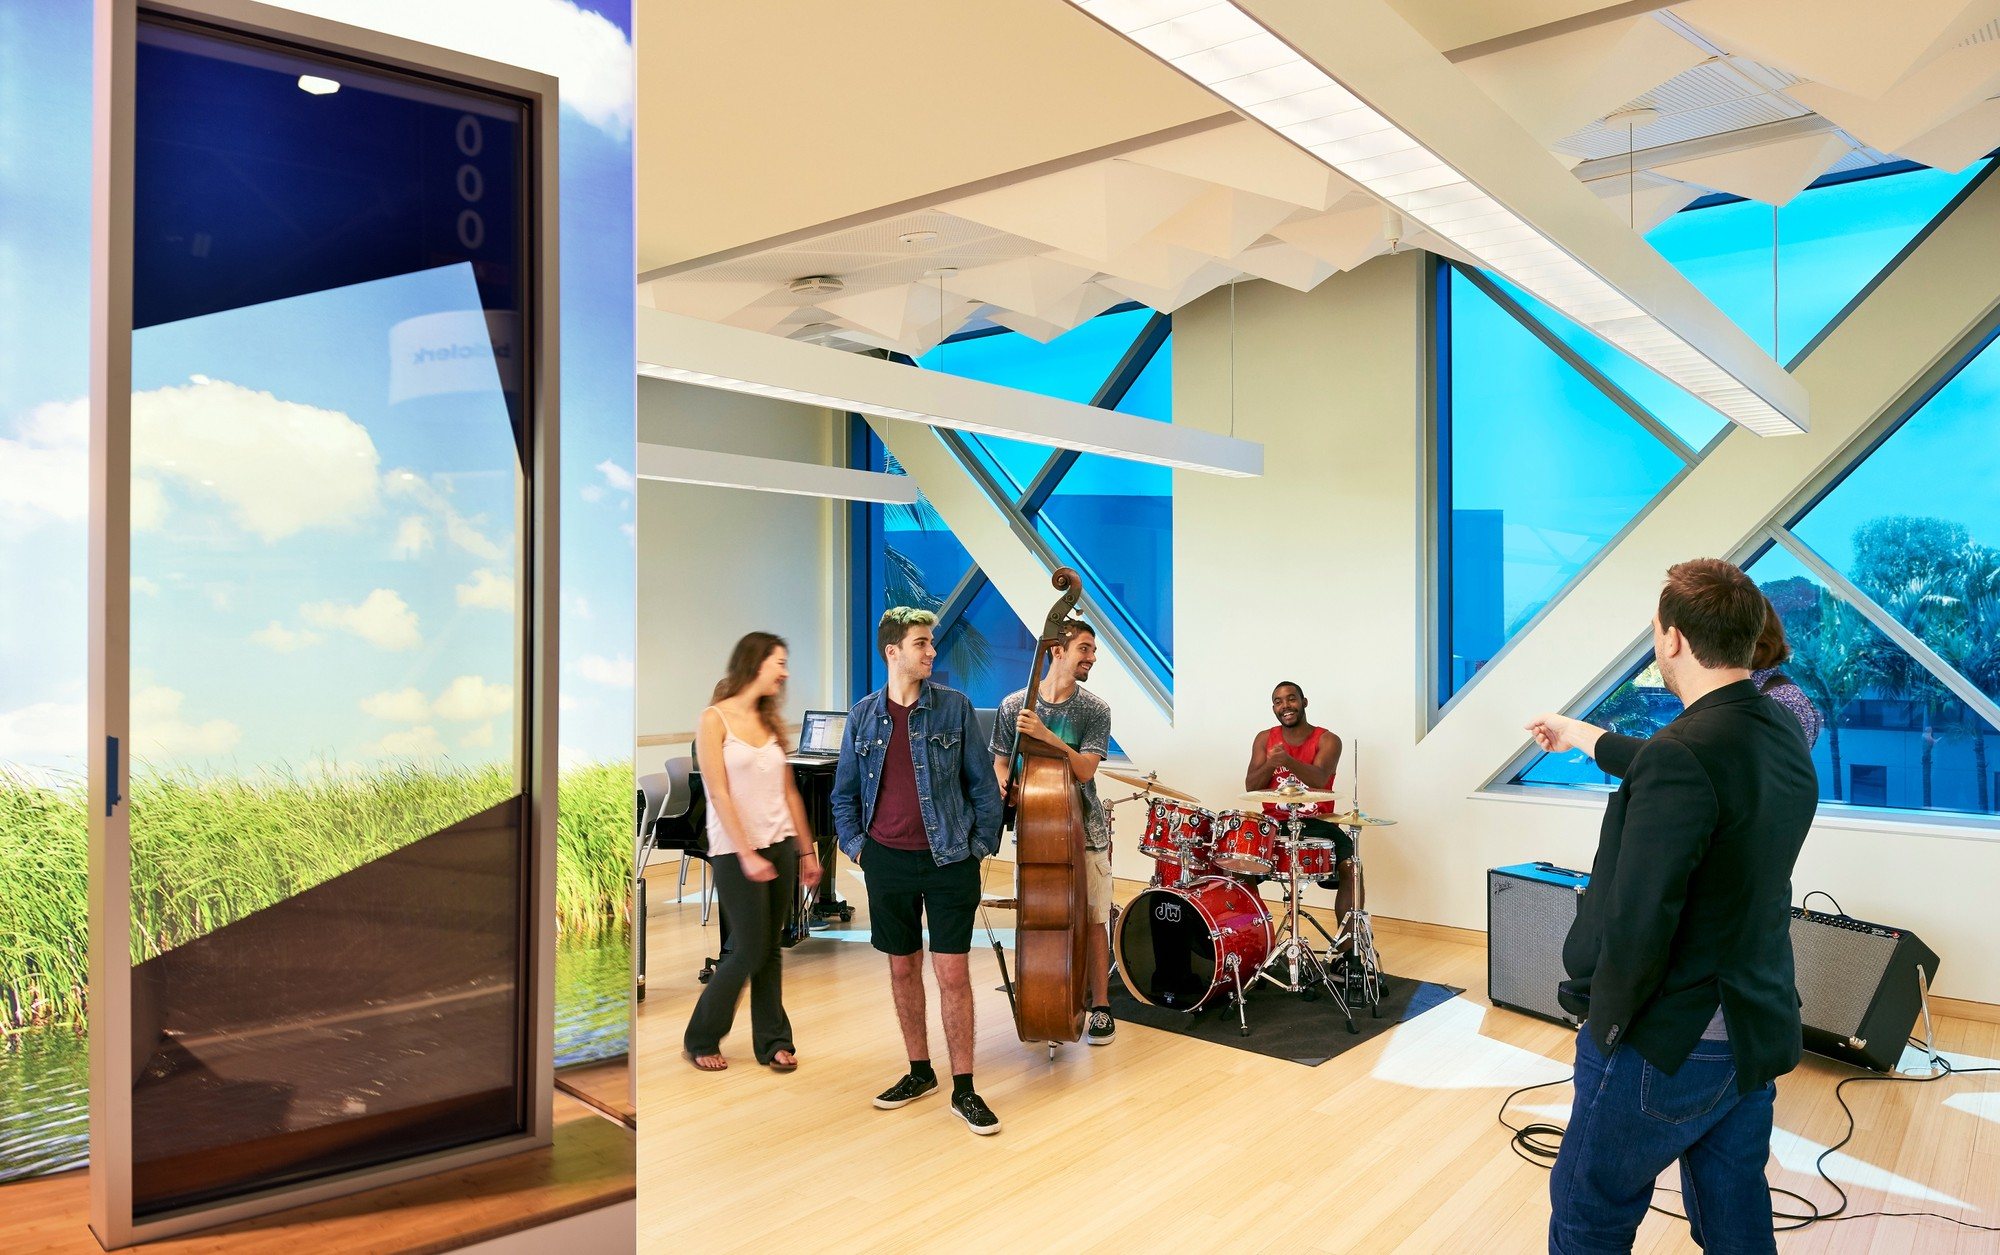 SageGlass Unveils Latest Developments in Smart Glass Technology, Courtesy of SageGlass